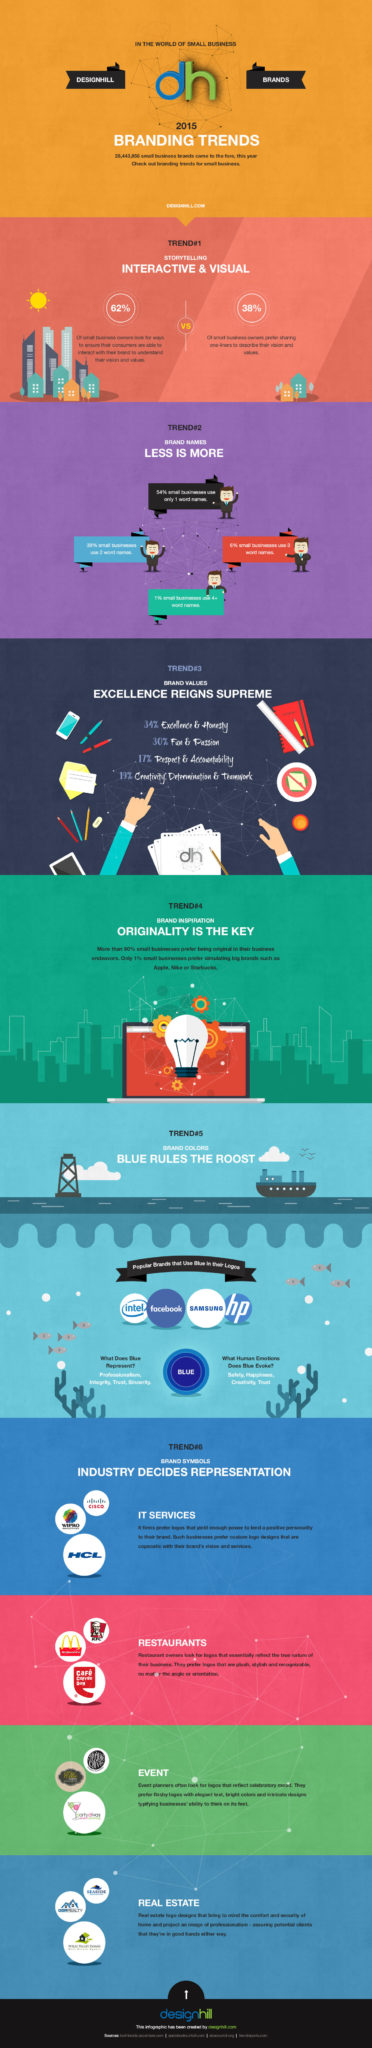 Poster design trends 2015 - Small Business Branding Trends 2015